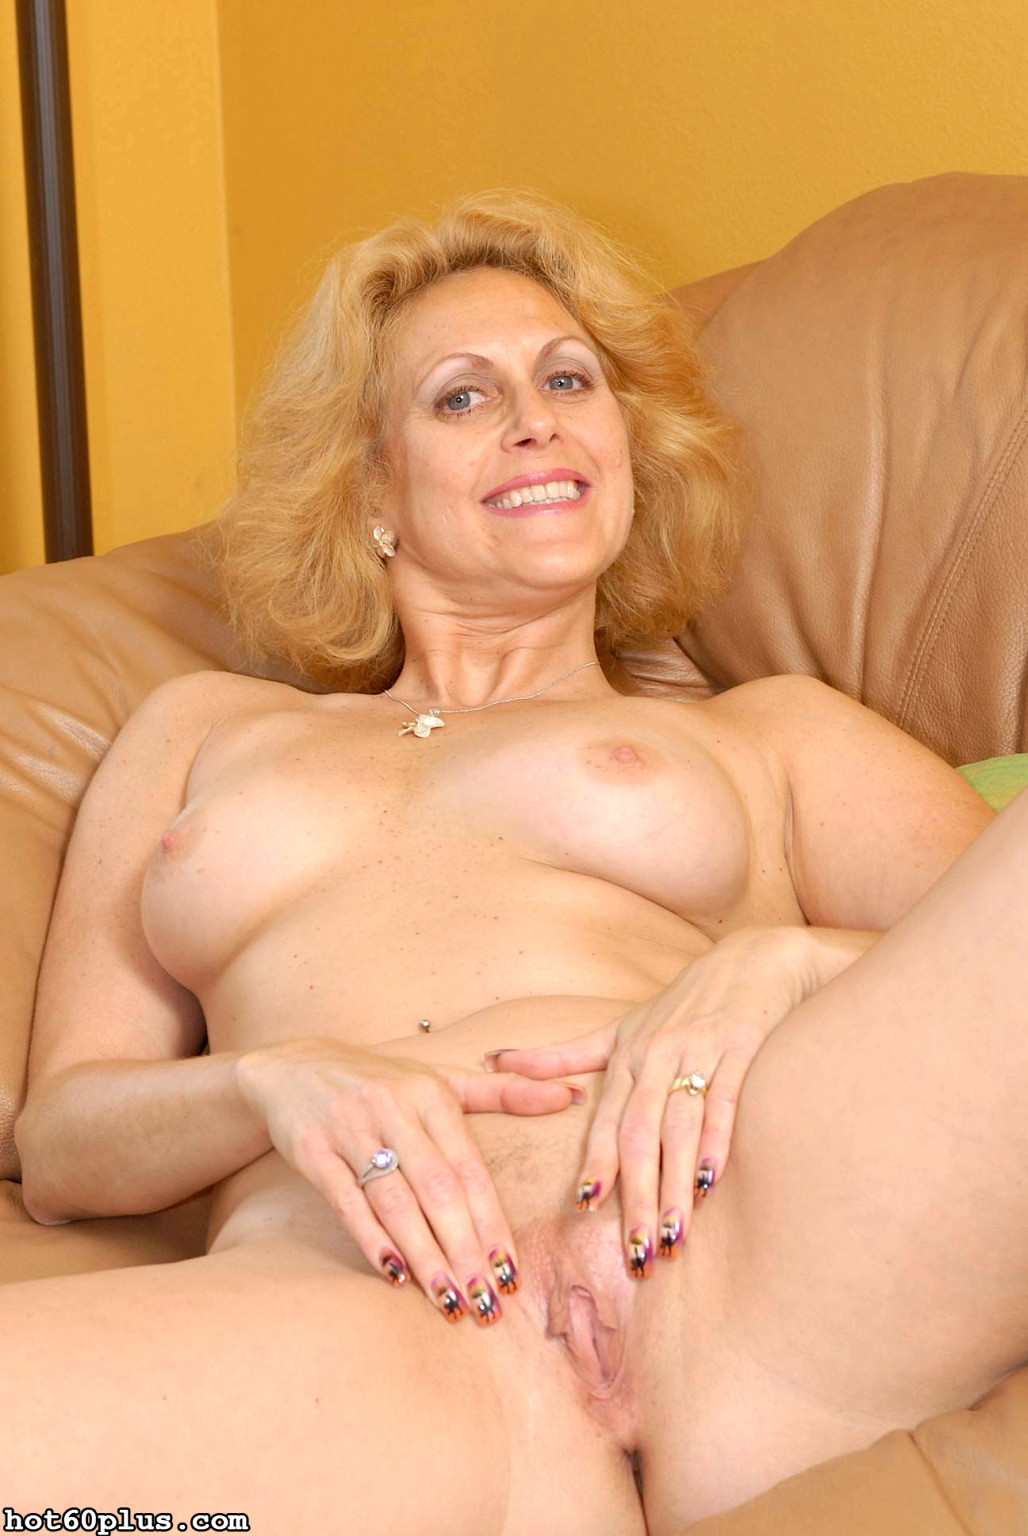 Big cock anal penetration close up